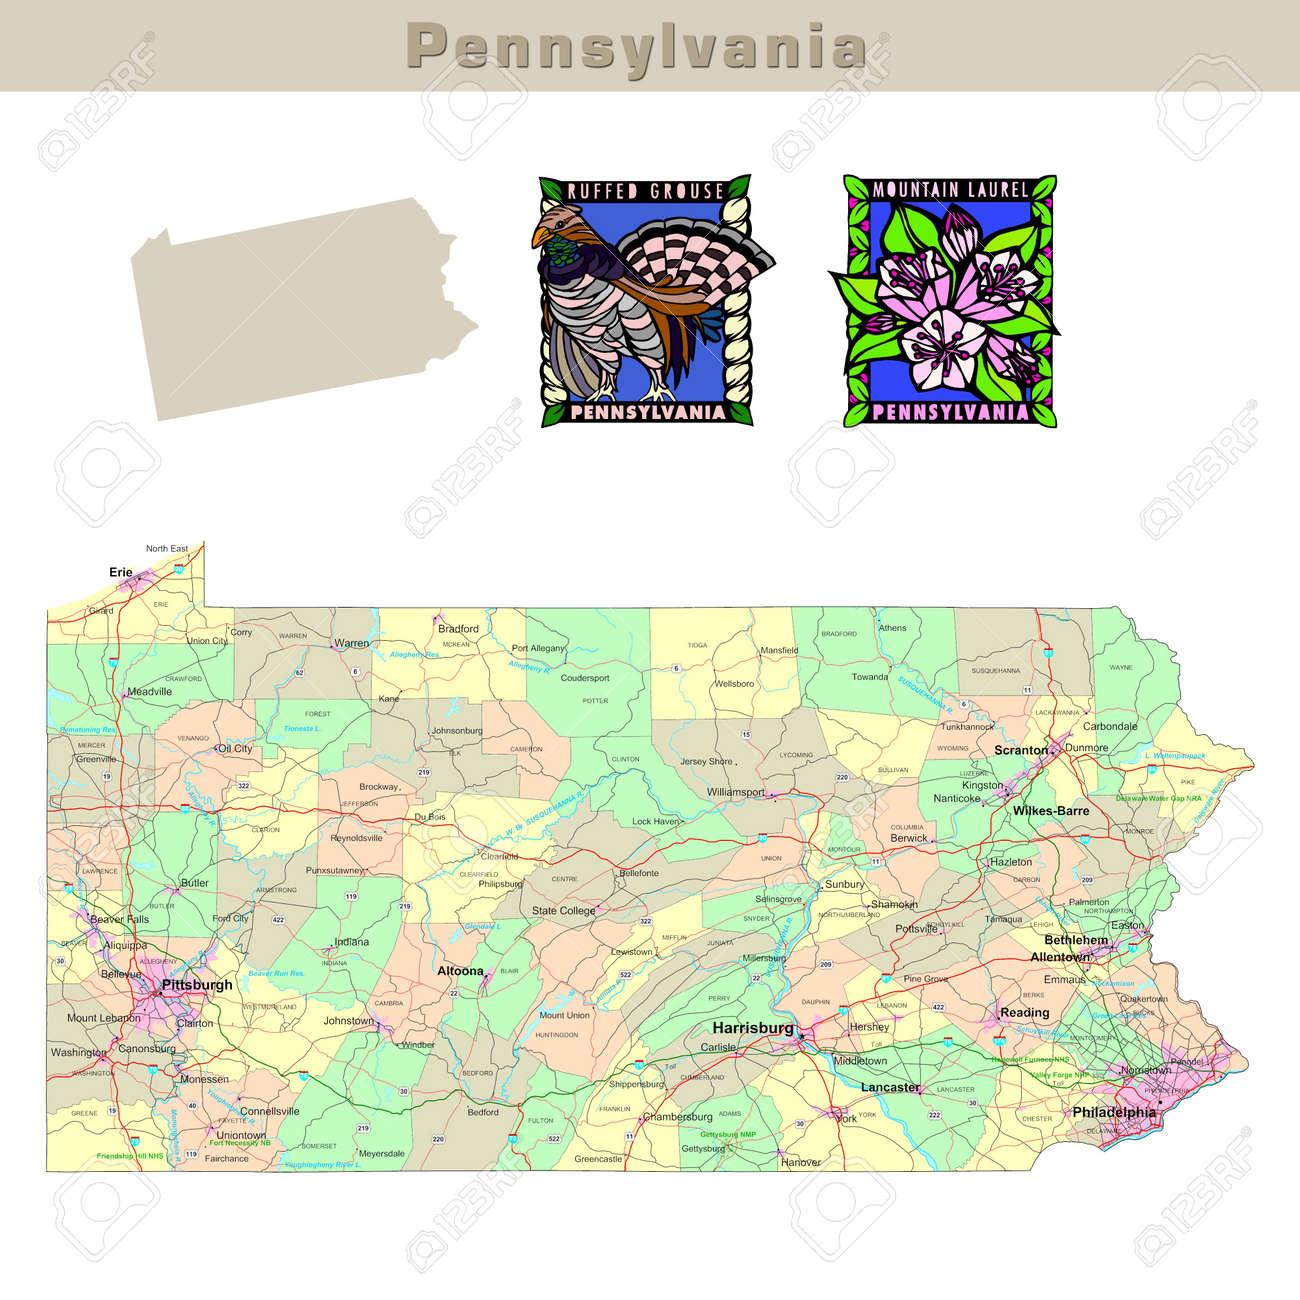 USA States Series Pennsylvania Political Map With Counties - Usa map with counties